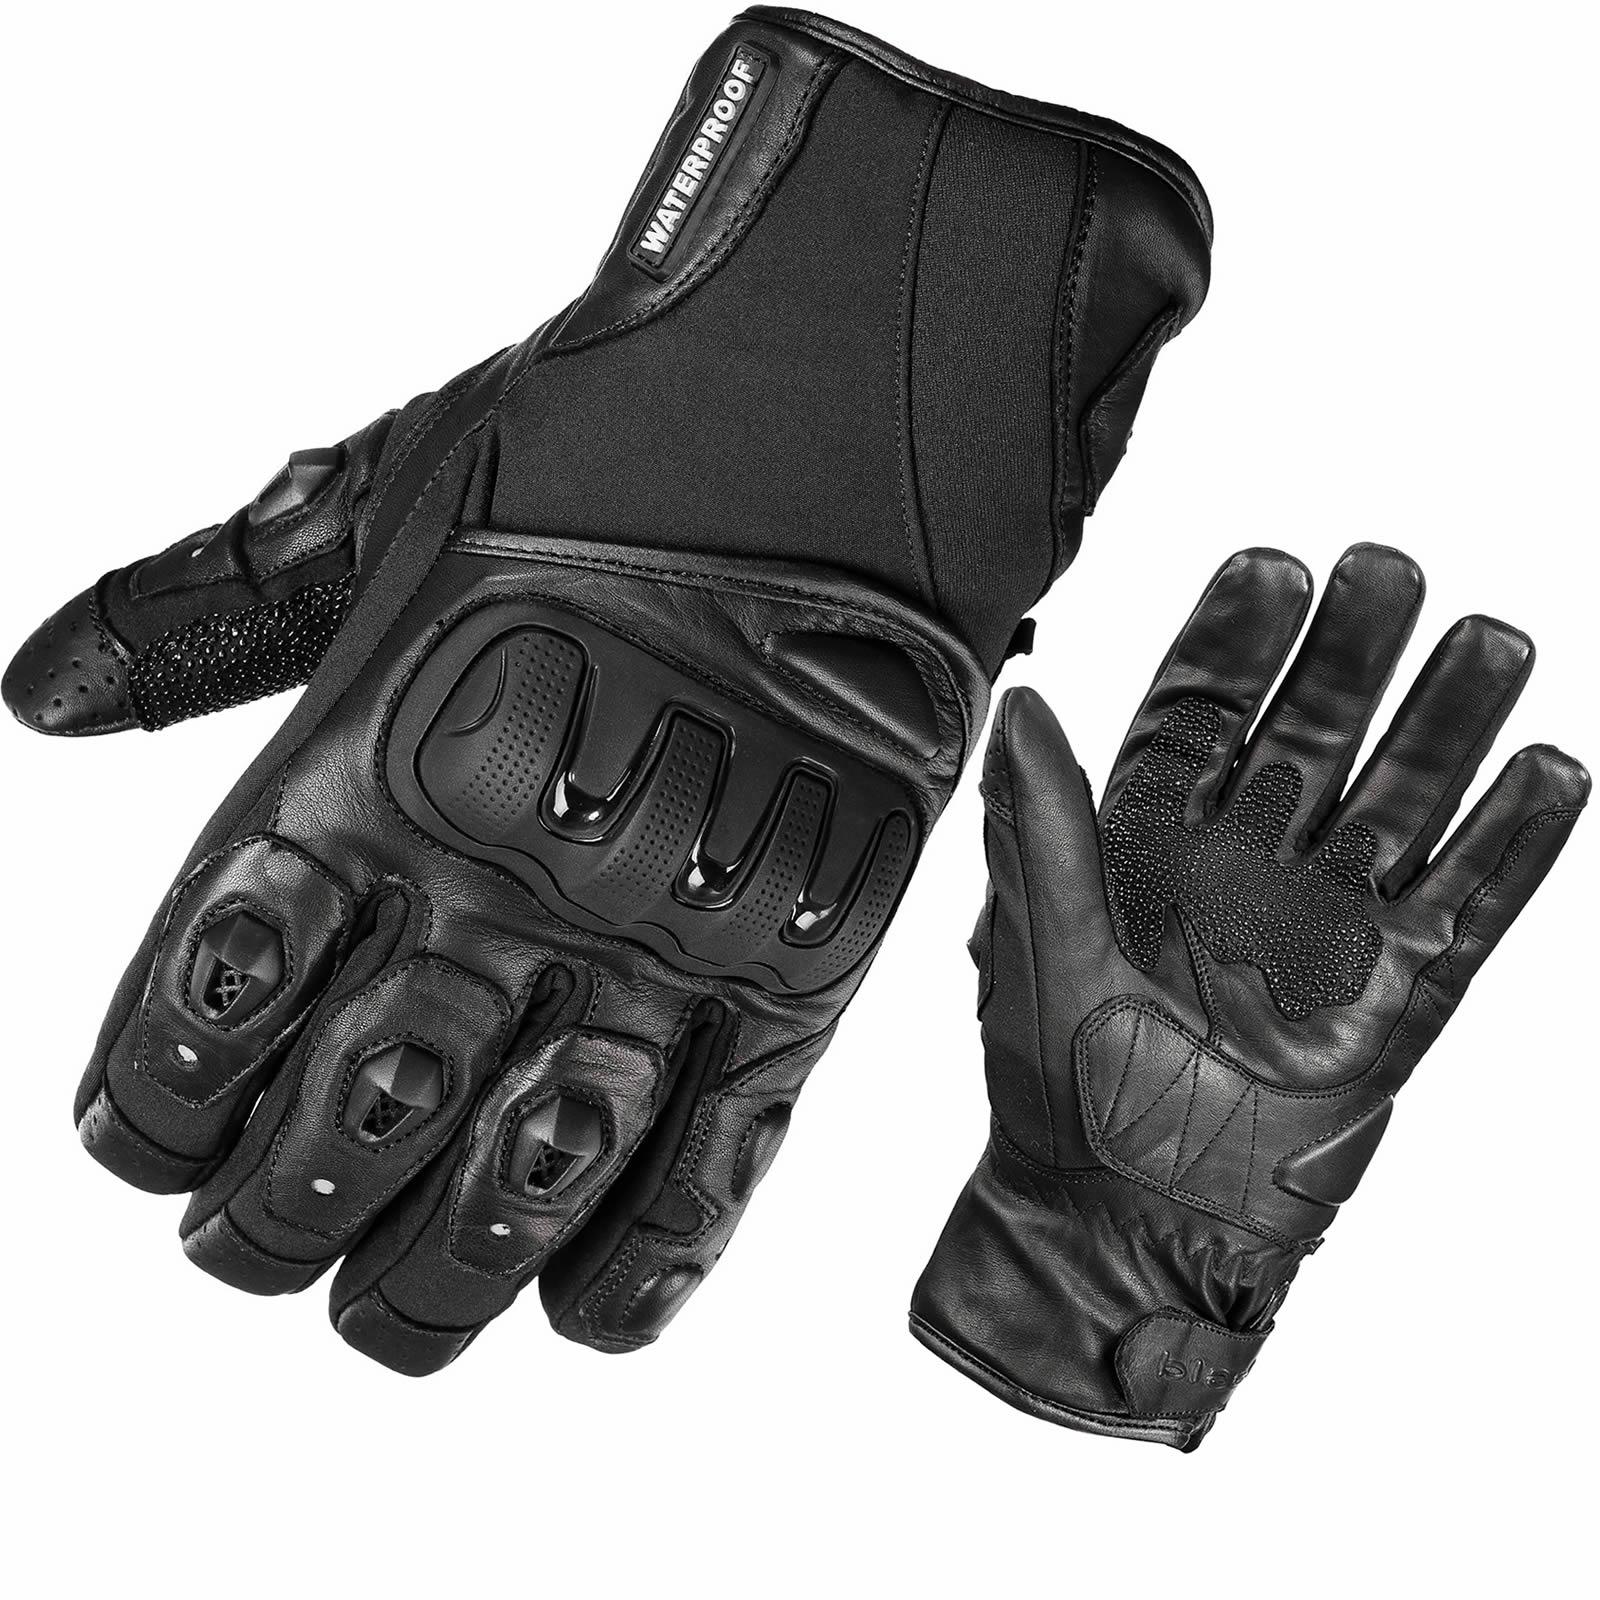 Spike WP Gloves